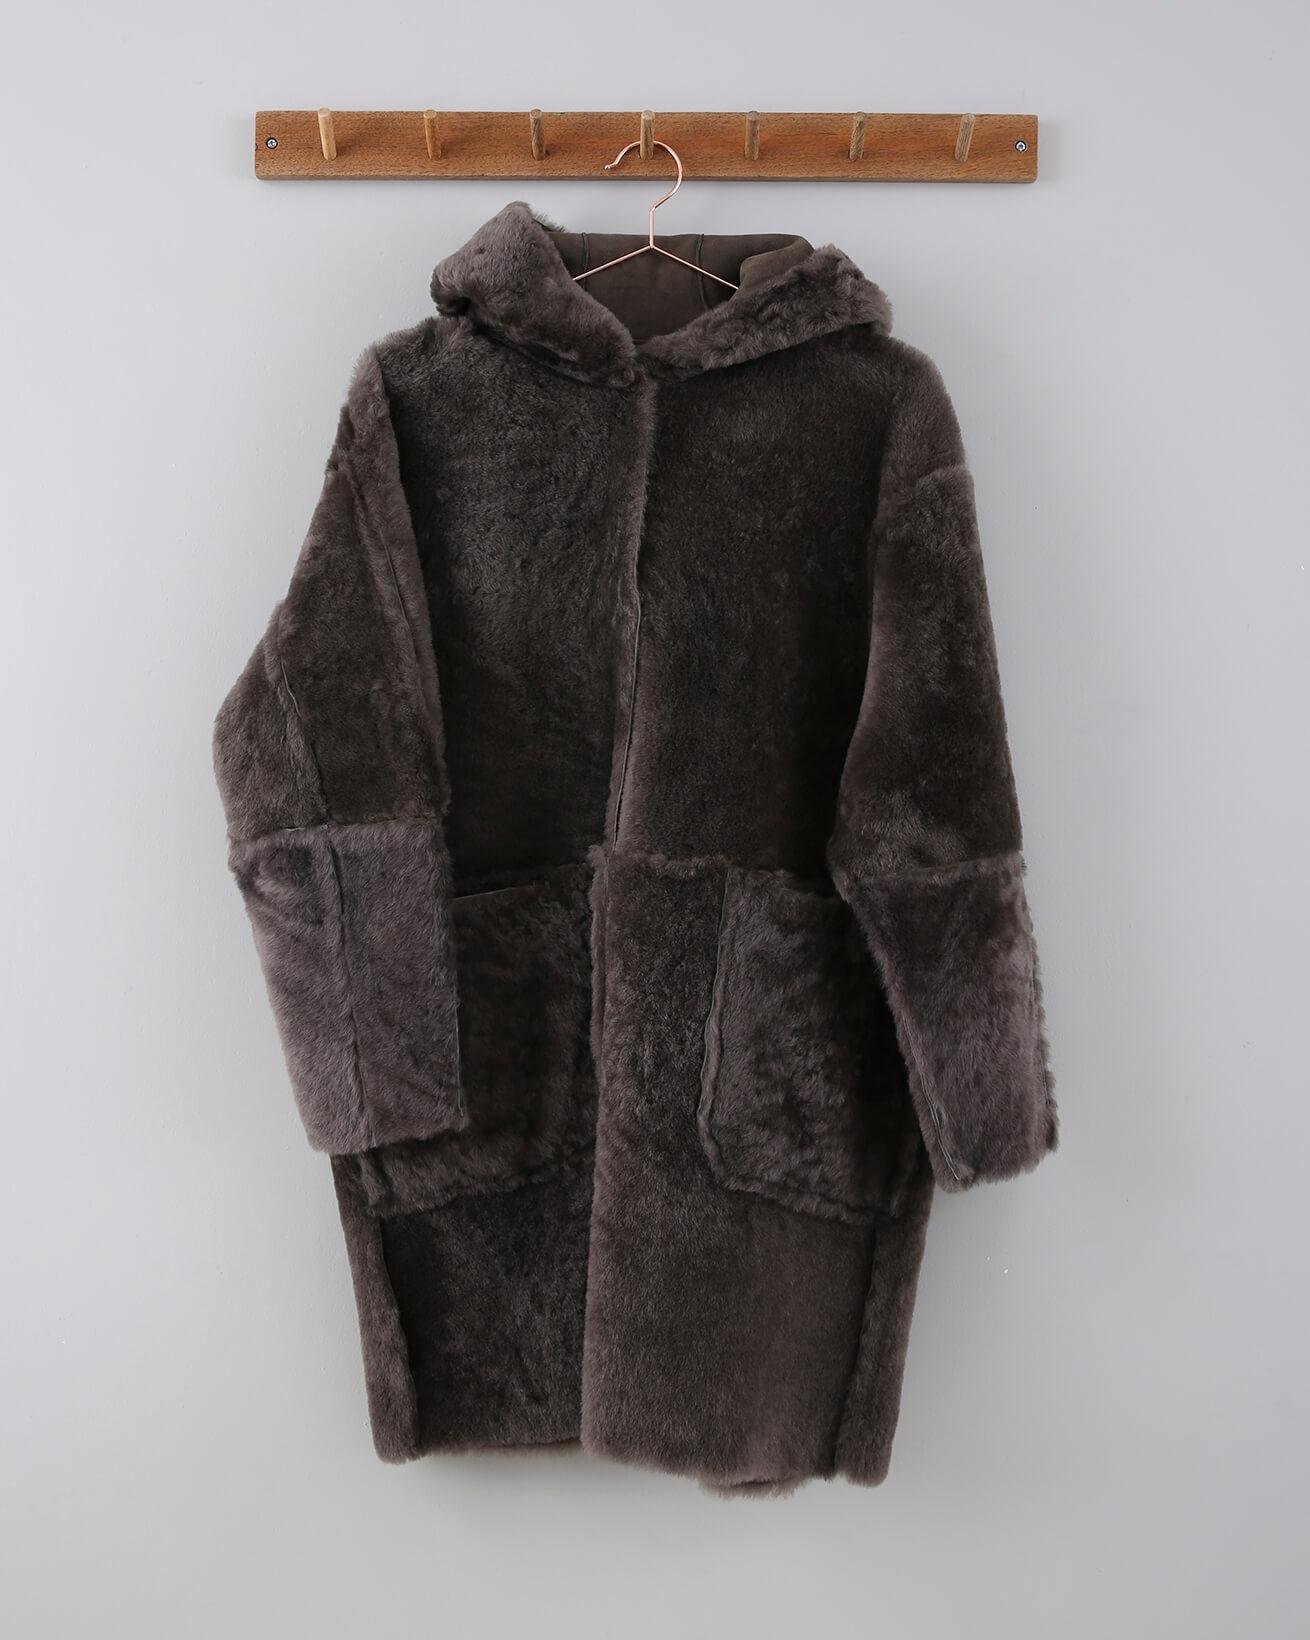 Reversible Hooded Car Coat  - Size 12 - 658